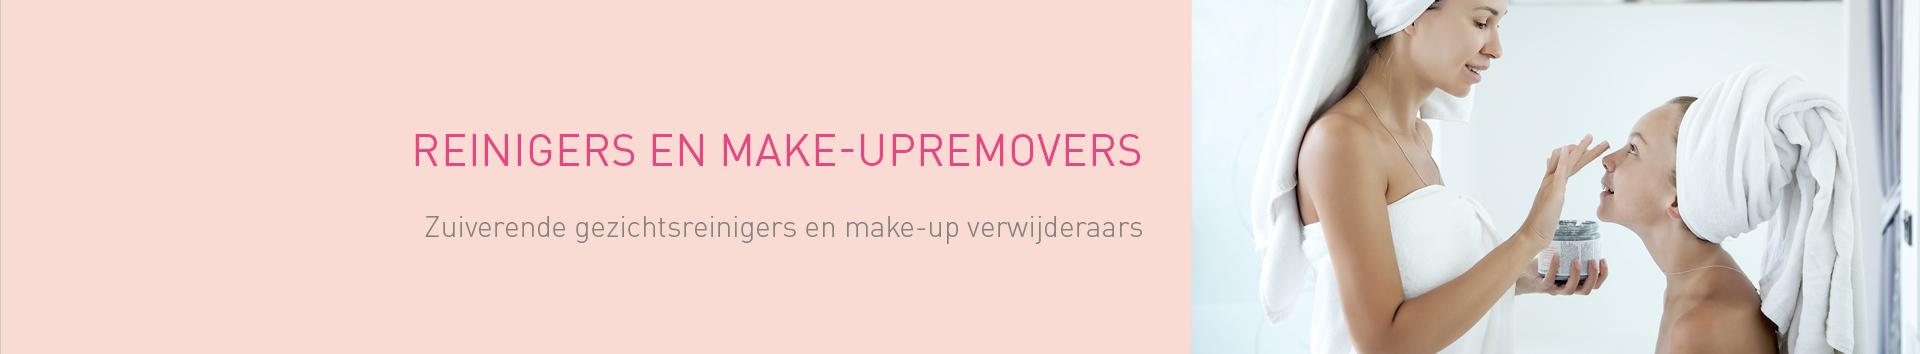 Reinigers en make-upremovers